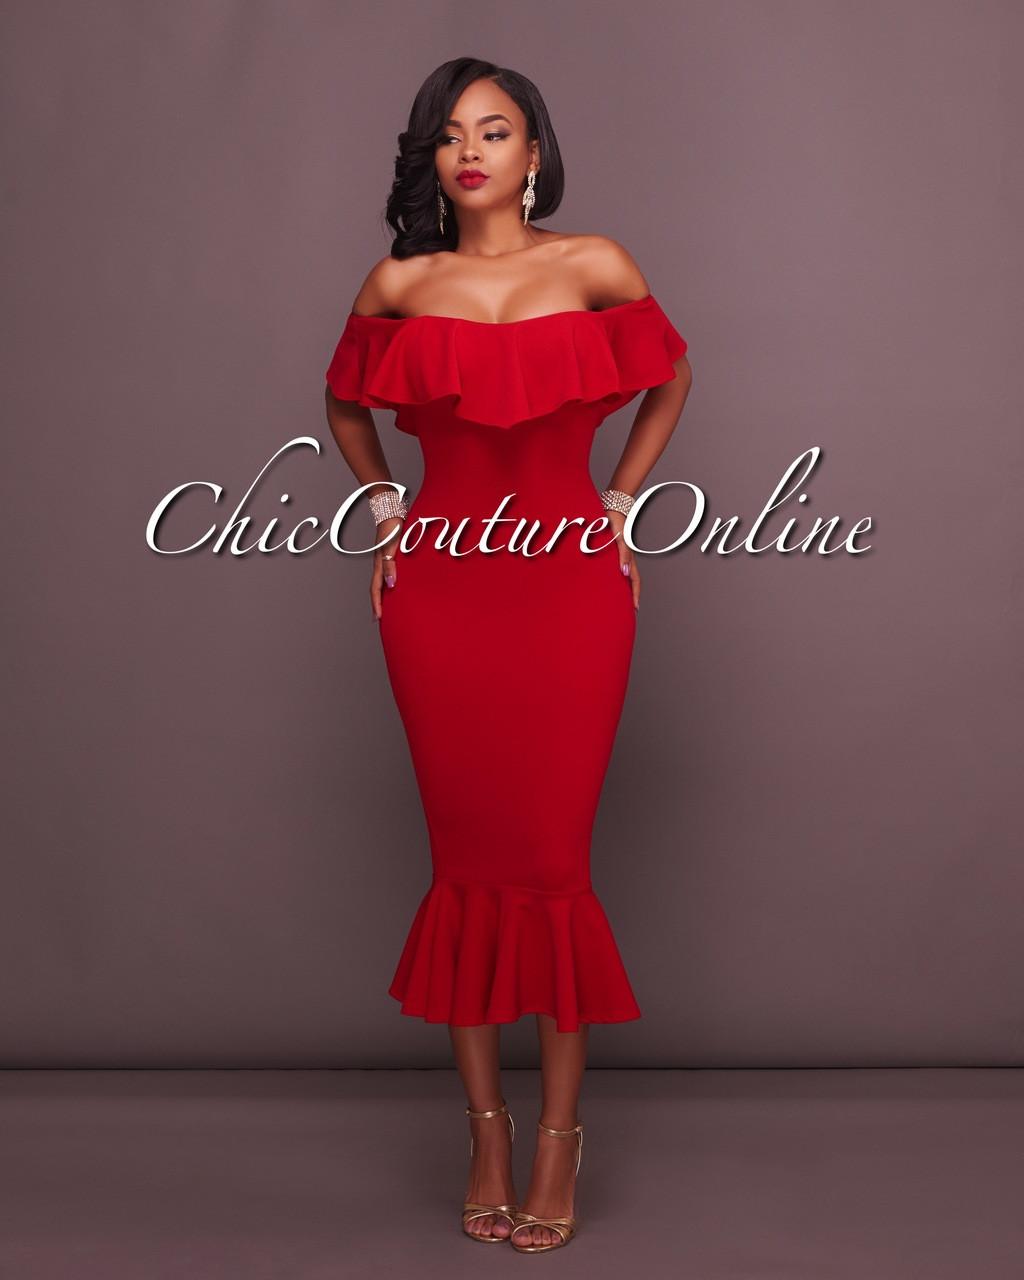 7091bf4787b9 Ekon Red Off-The-Shoulder Ruffle Midi Dress. Price   50.00. Image 1